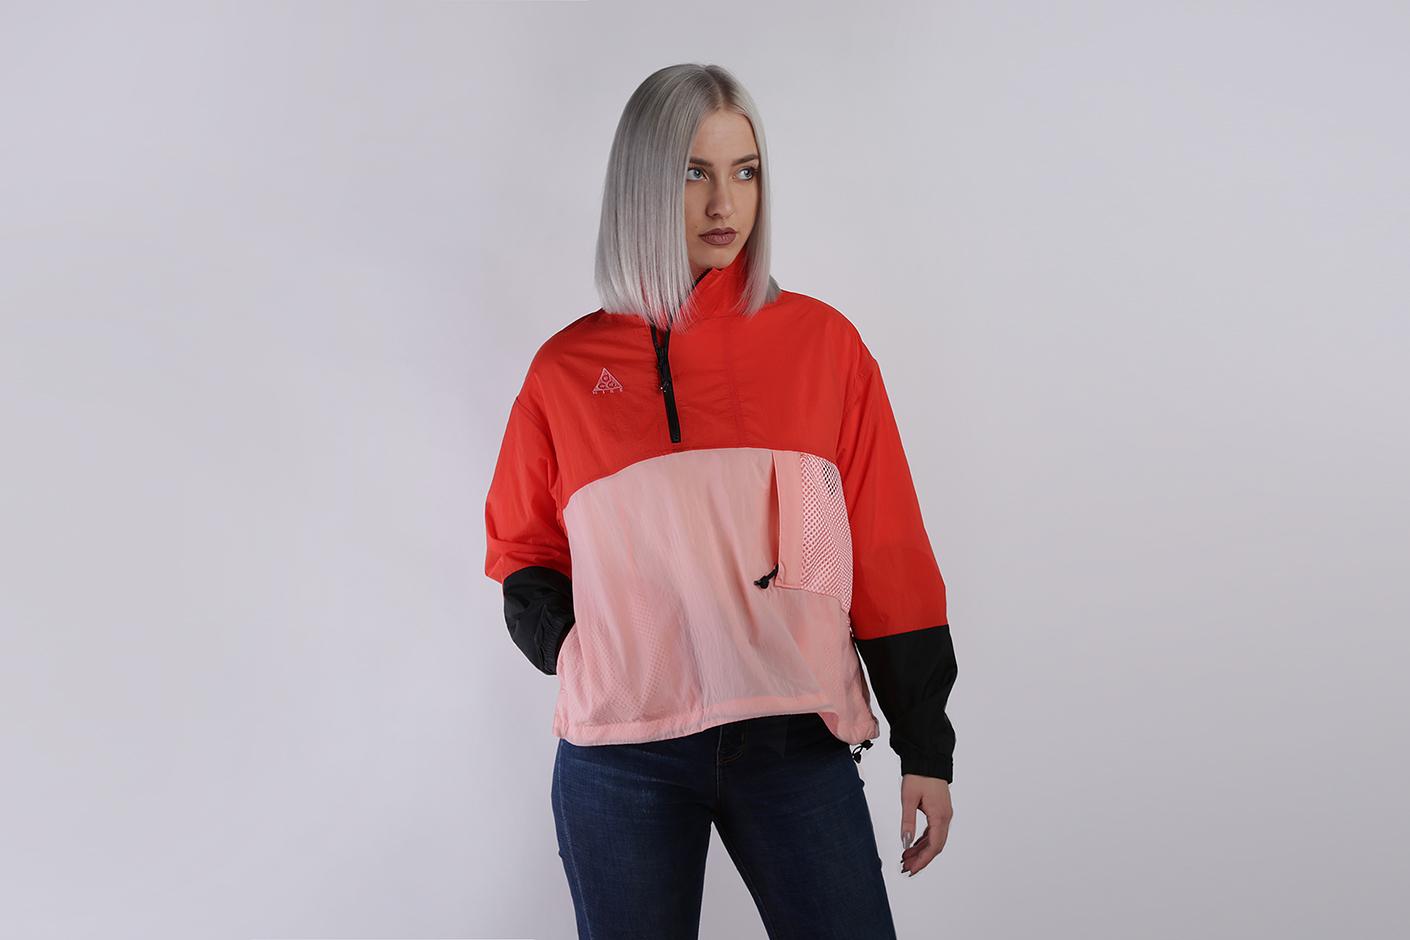 9be1158e Красный, розовая женская куртка ACG Anorak от Nike (BQ3615-634) по ...